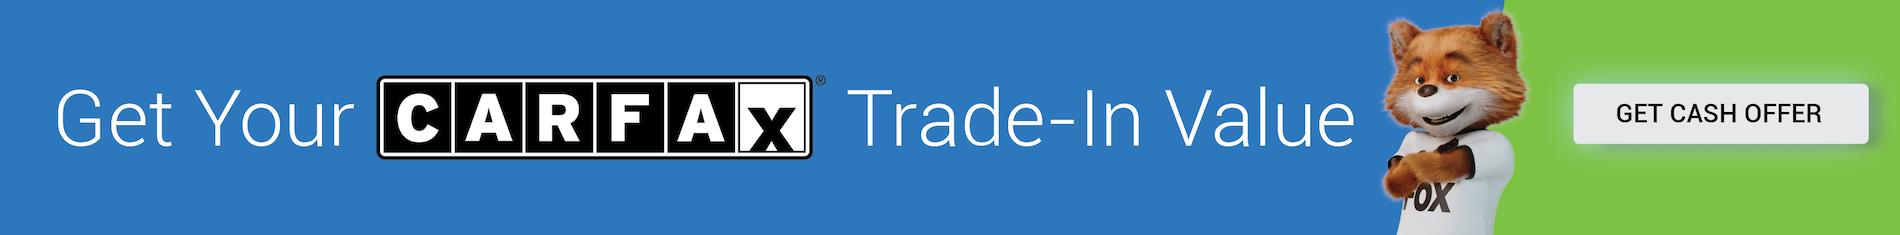 CarFax Trade In